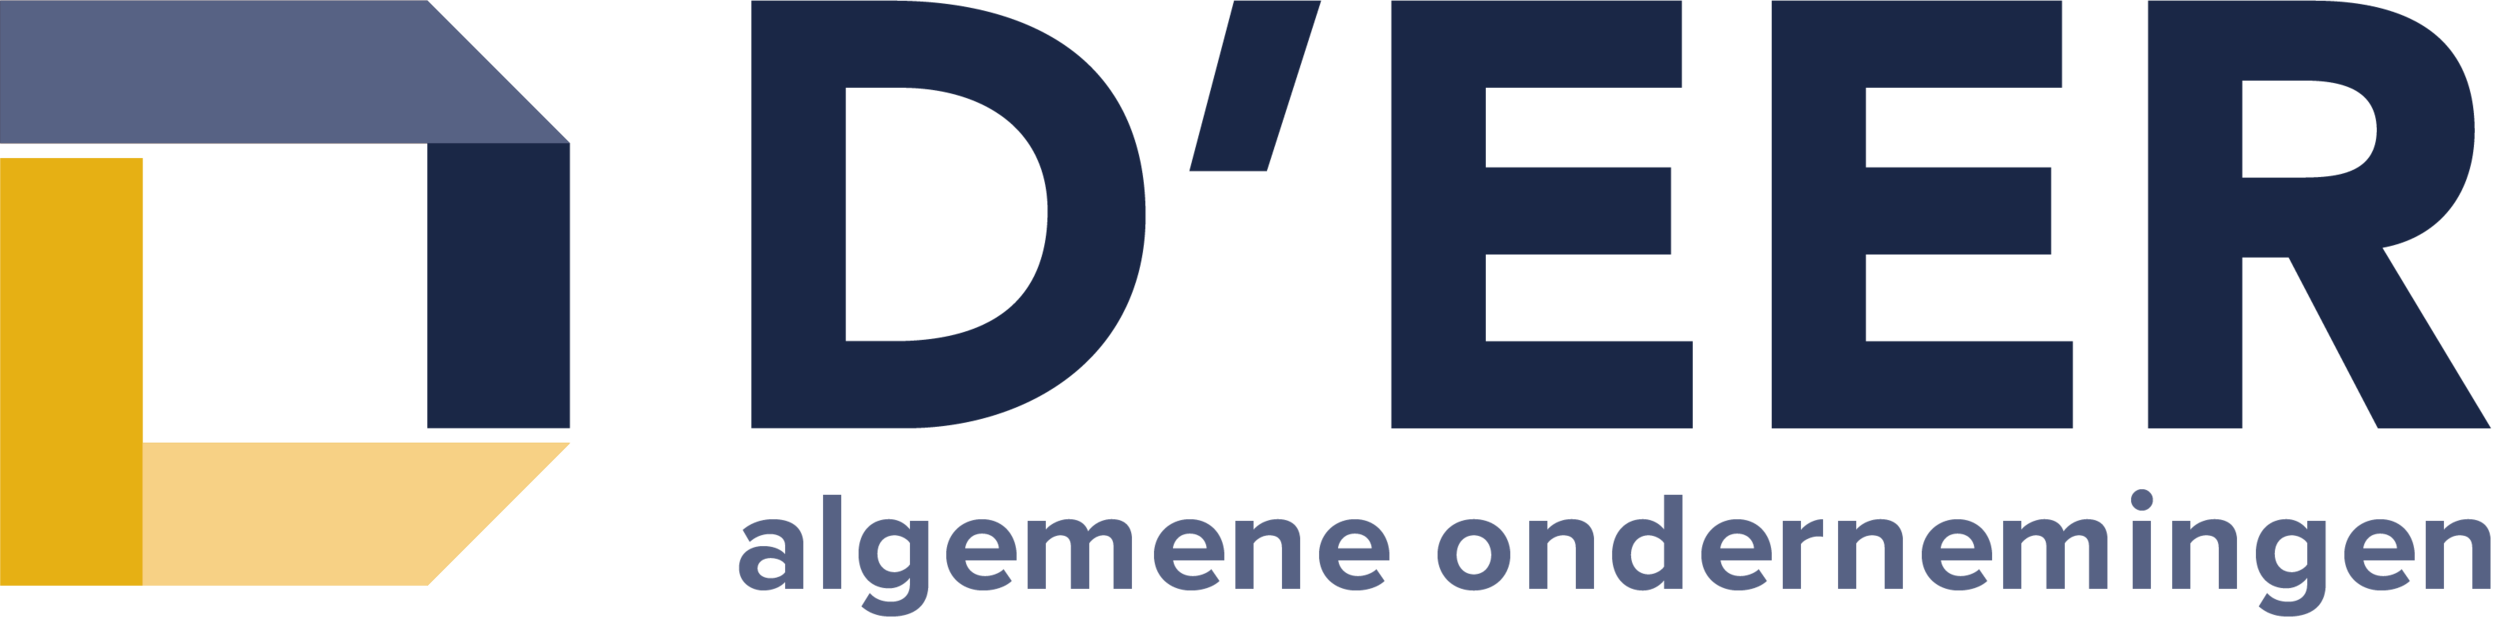 Deer_logo.png